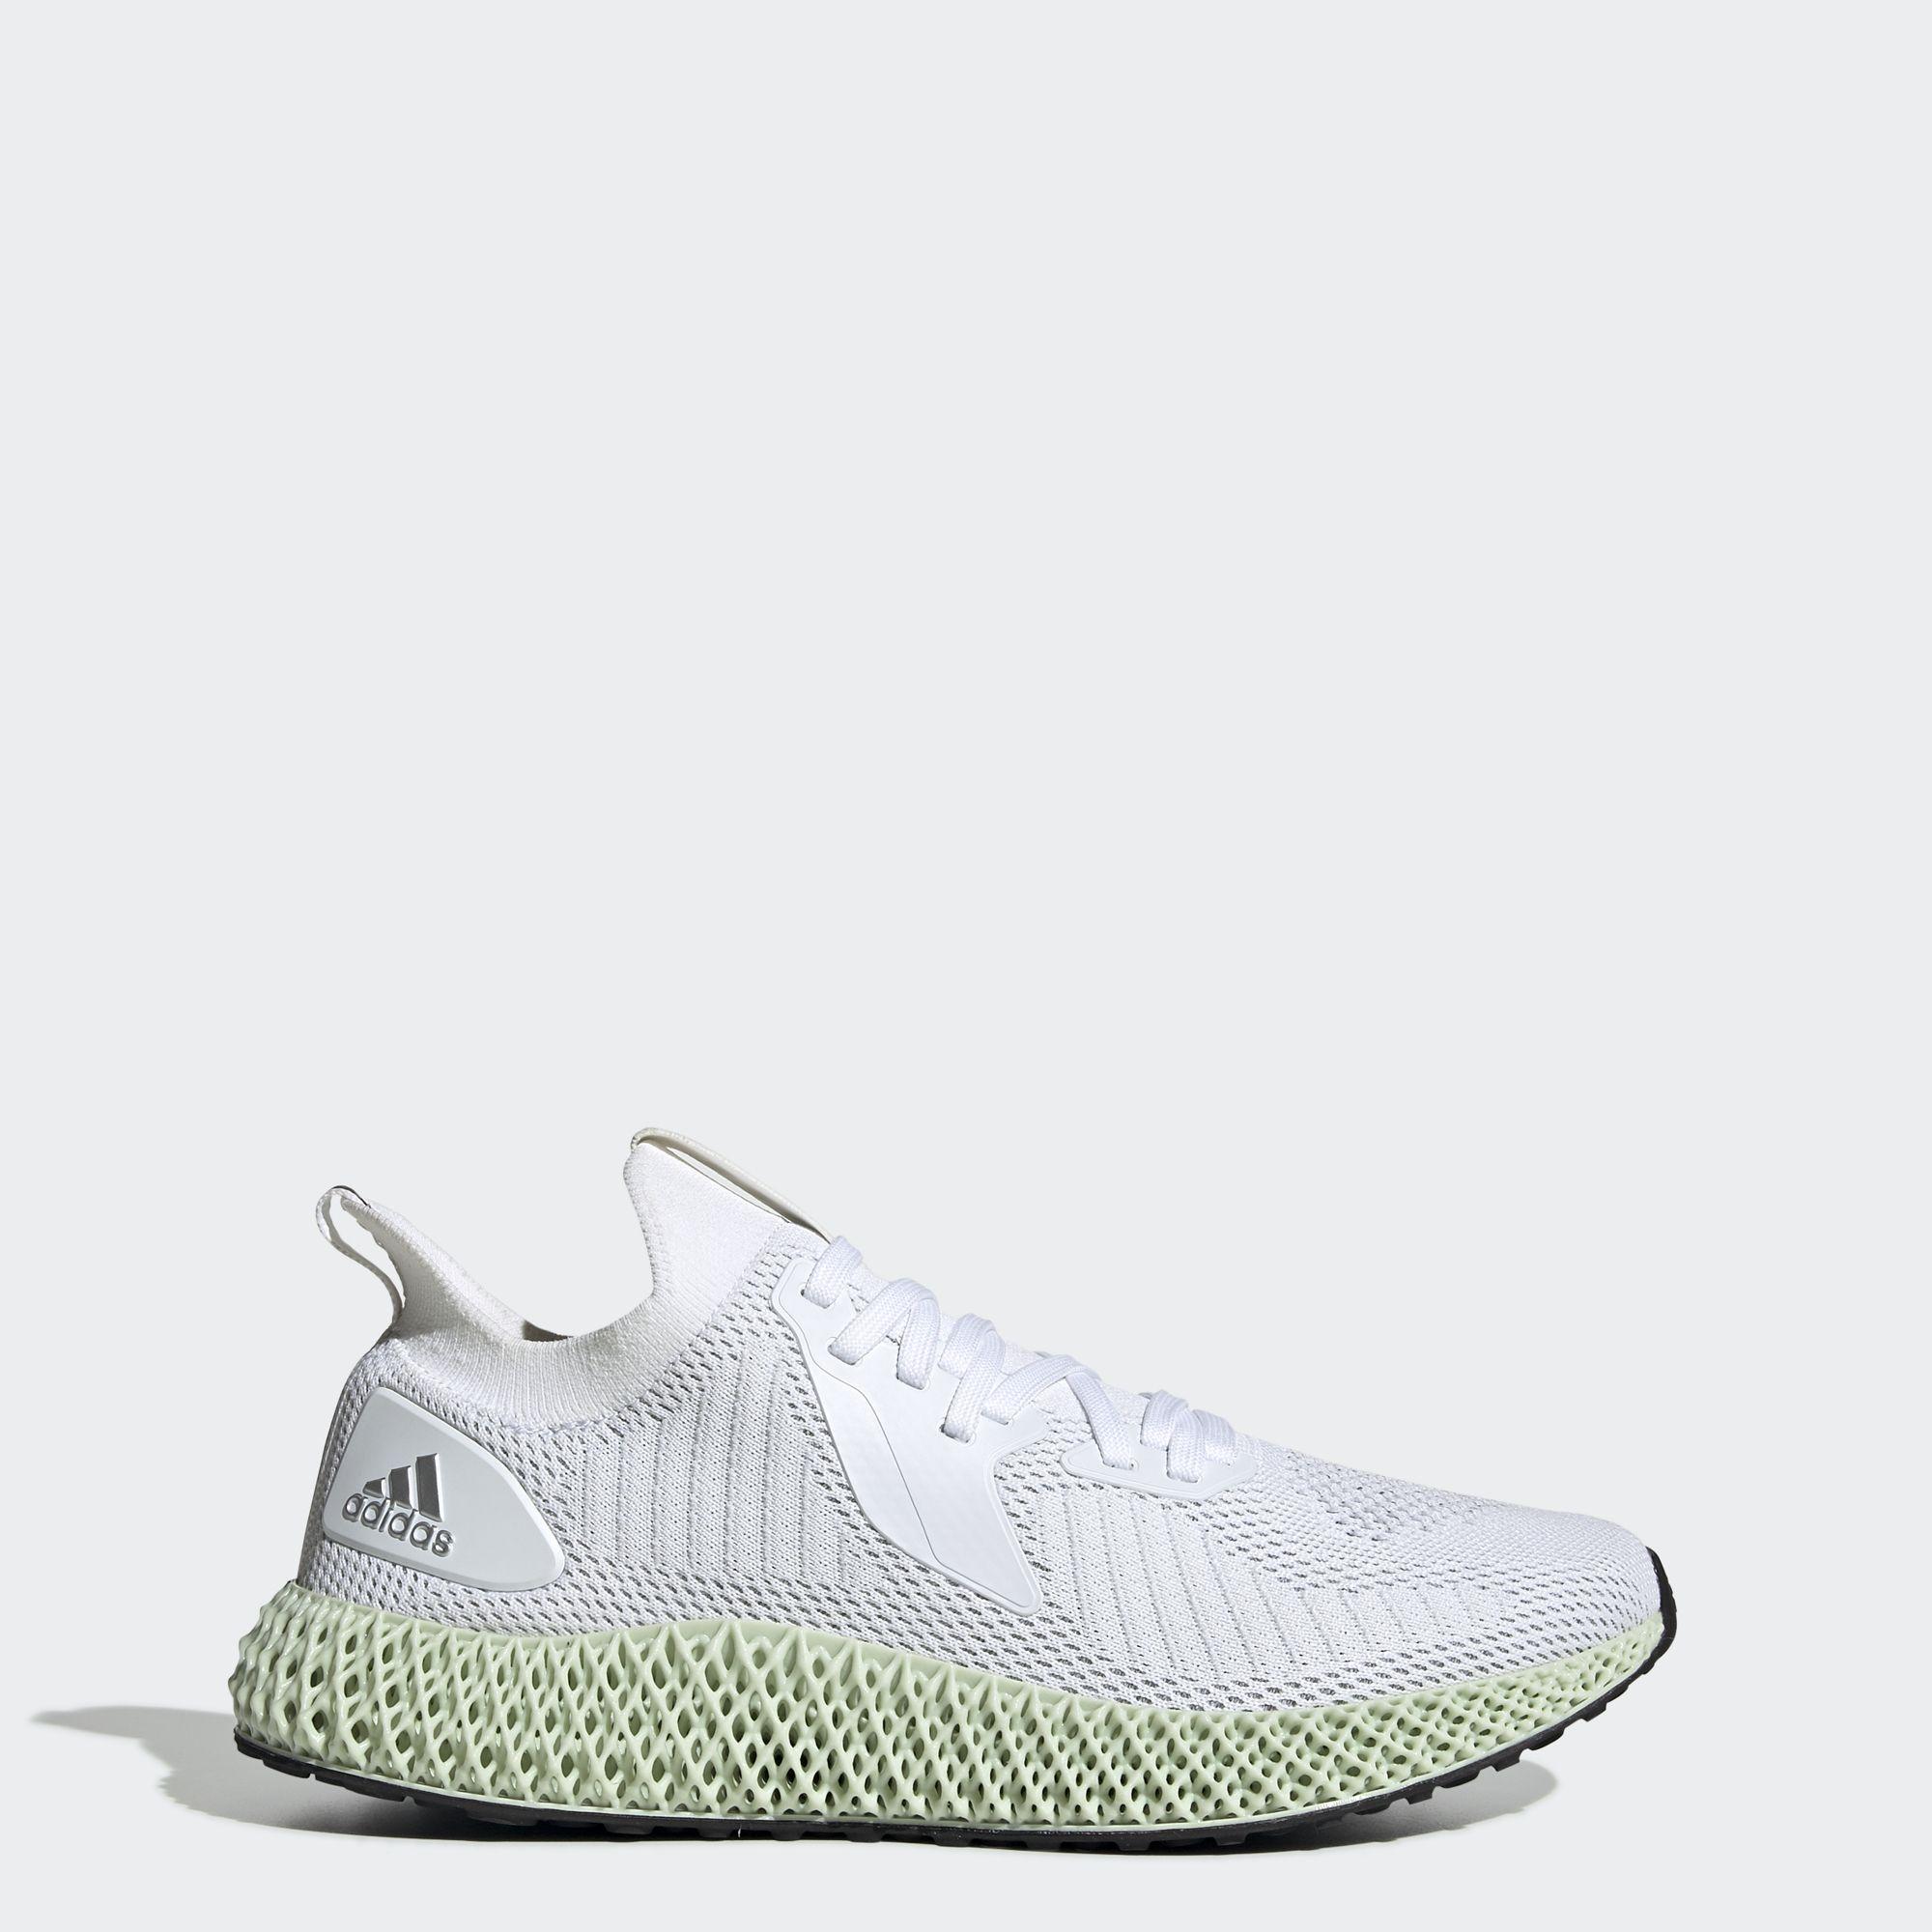 Buy Running Shoes | lazada.sg